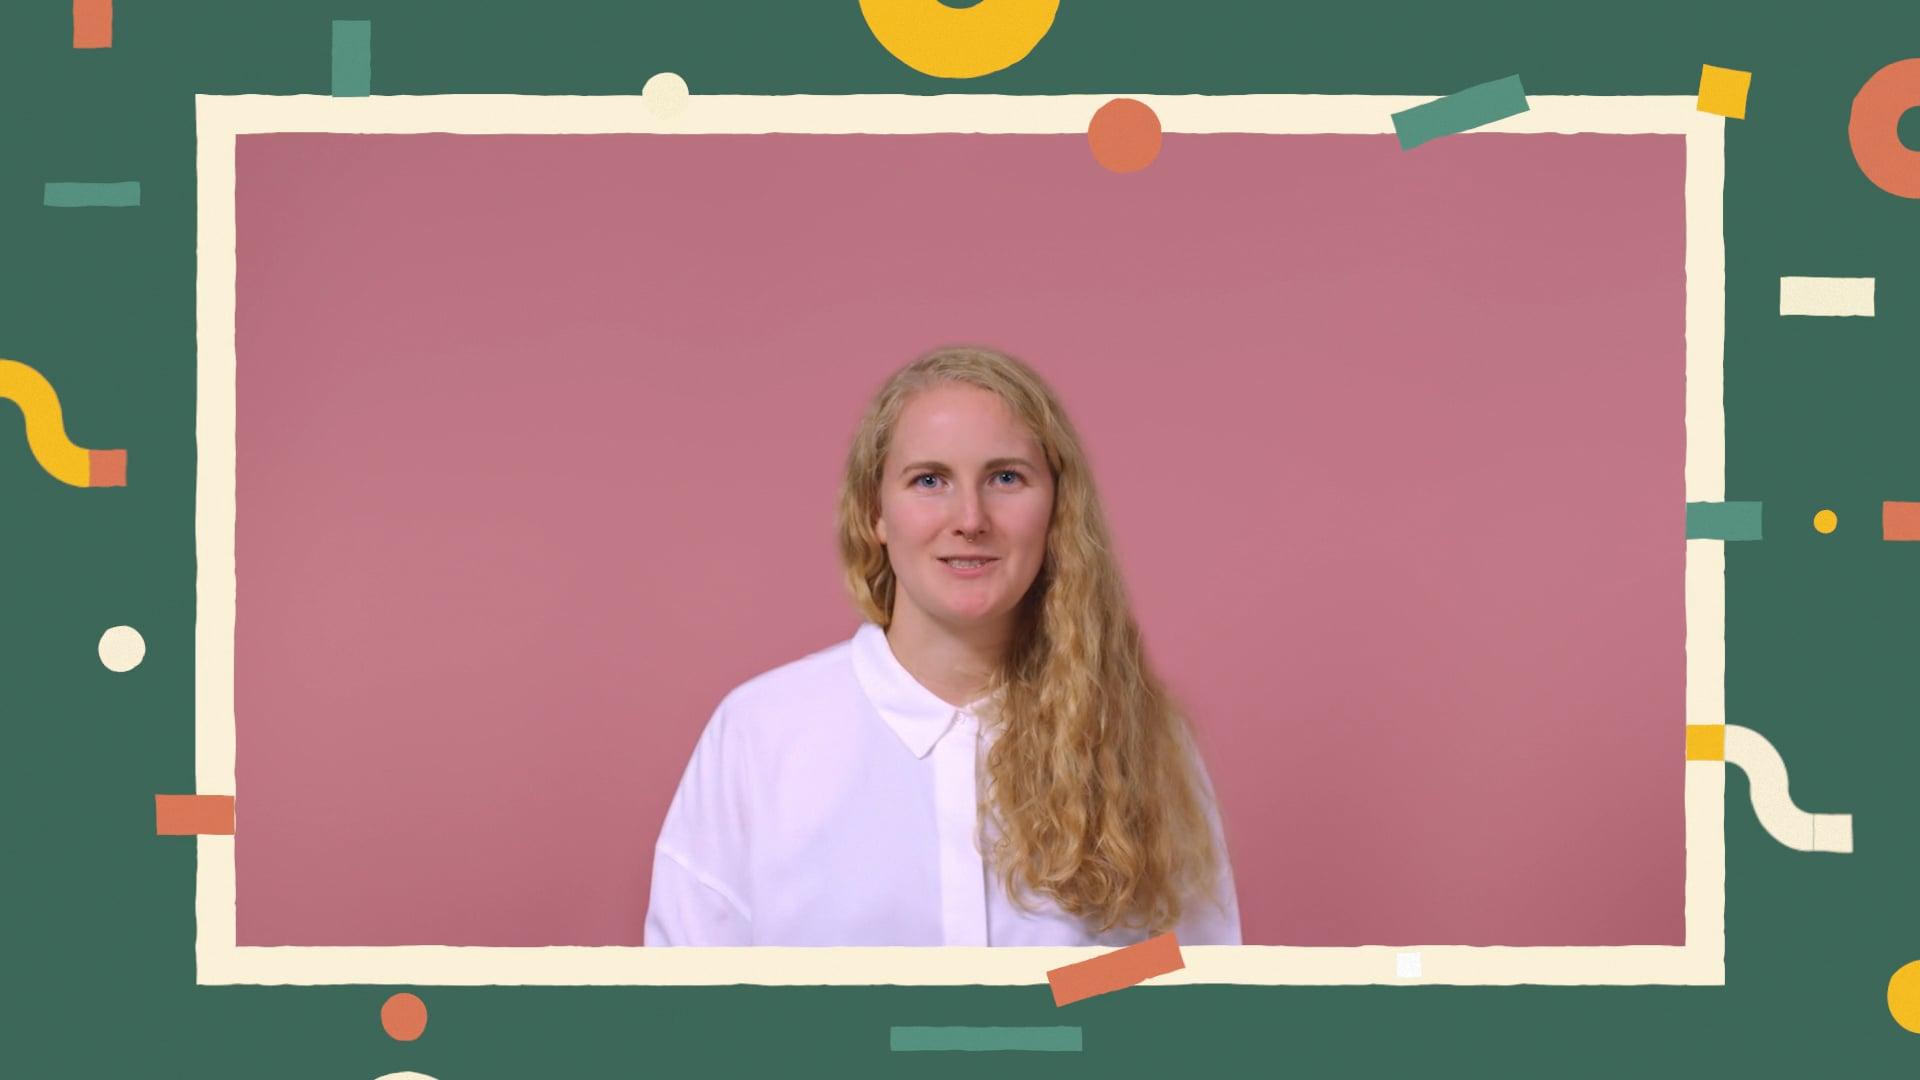 A Little Film About... Petra Eriksson